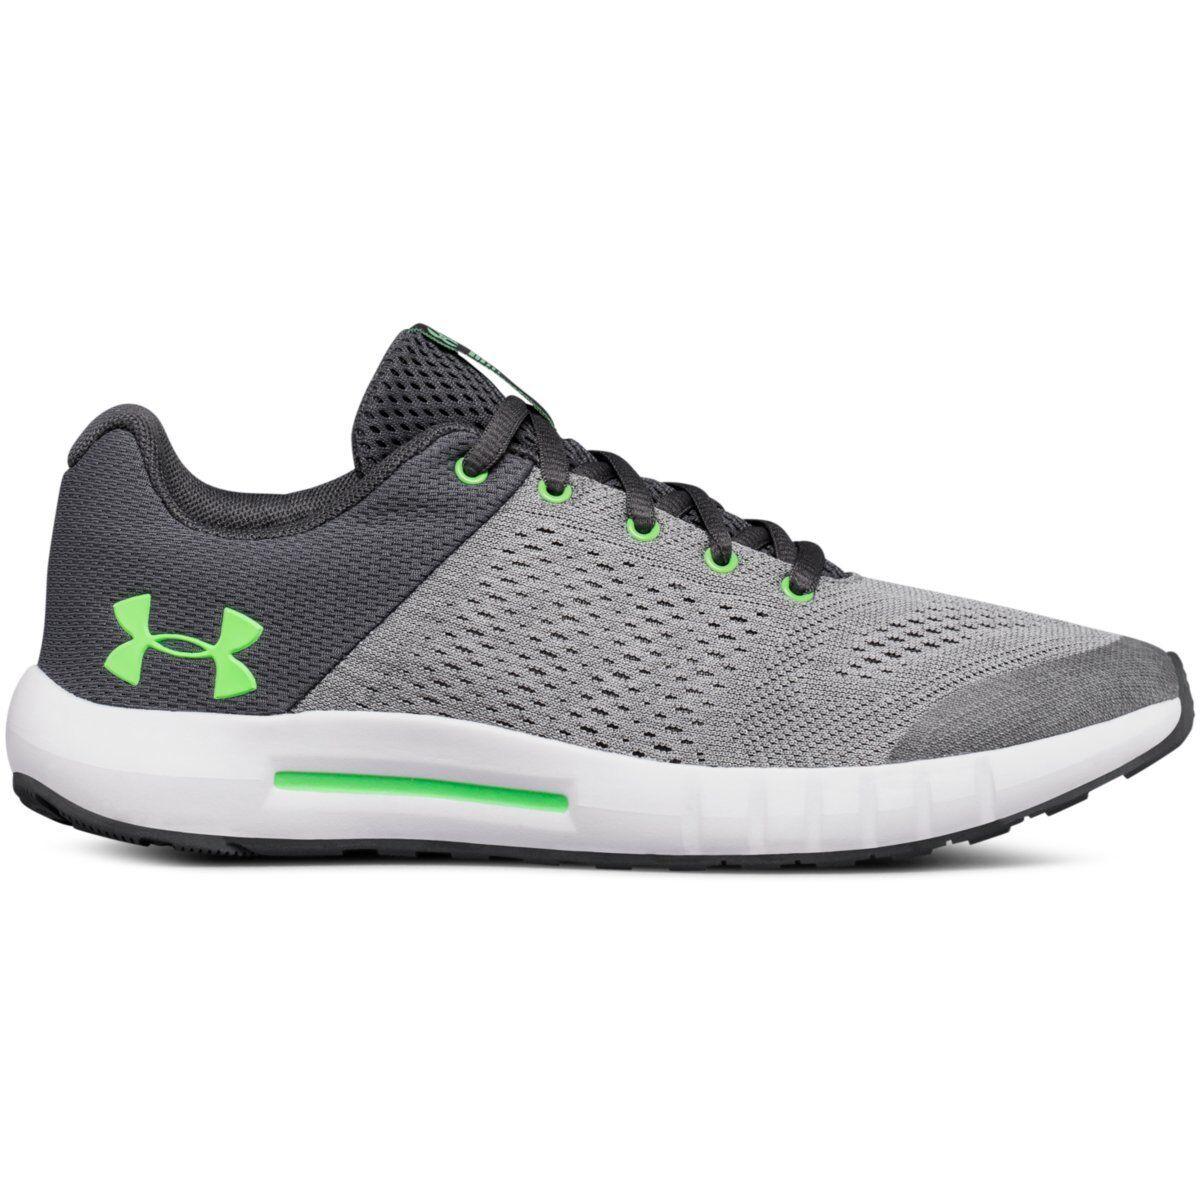 Under Armour Big Boys' Grade School Ua Pursuit Running Shoes